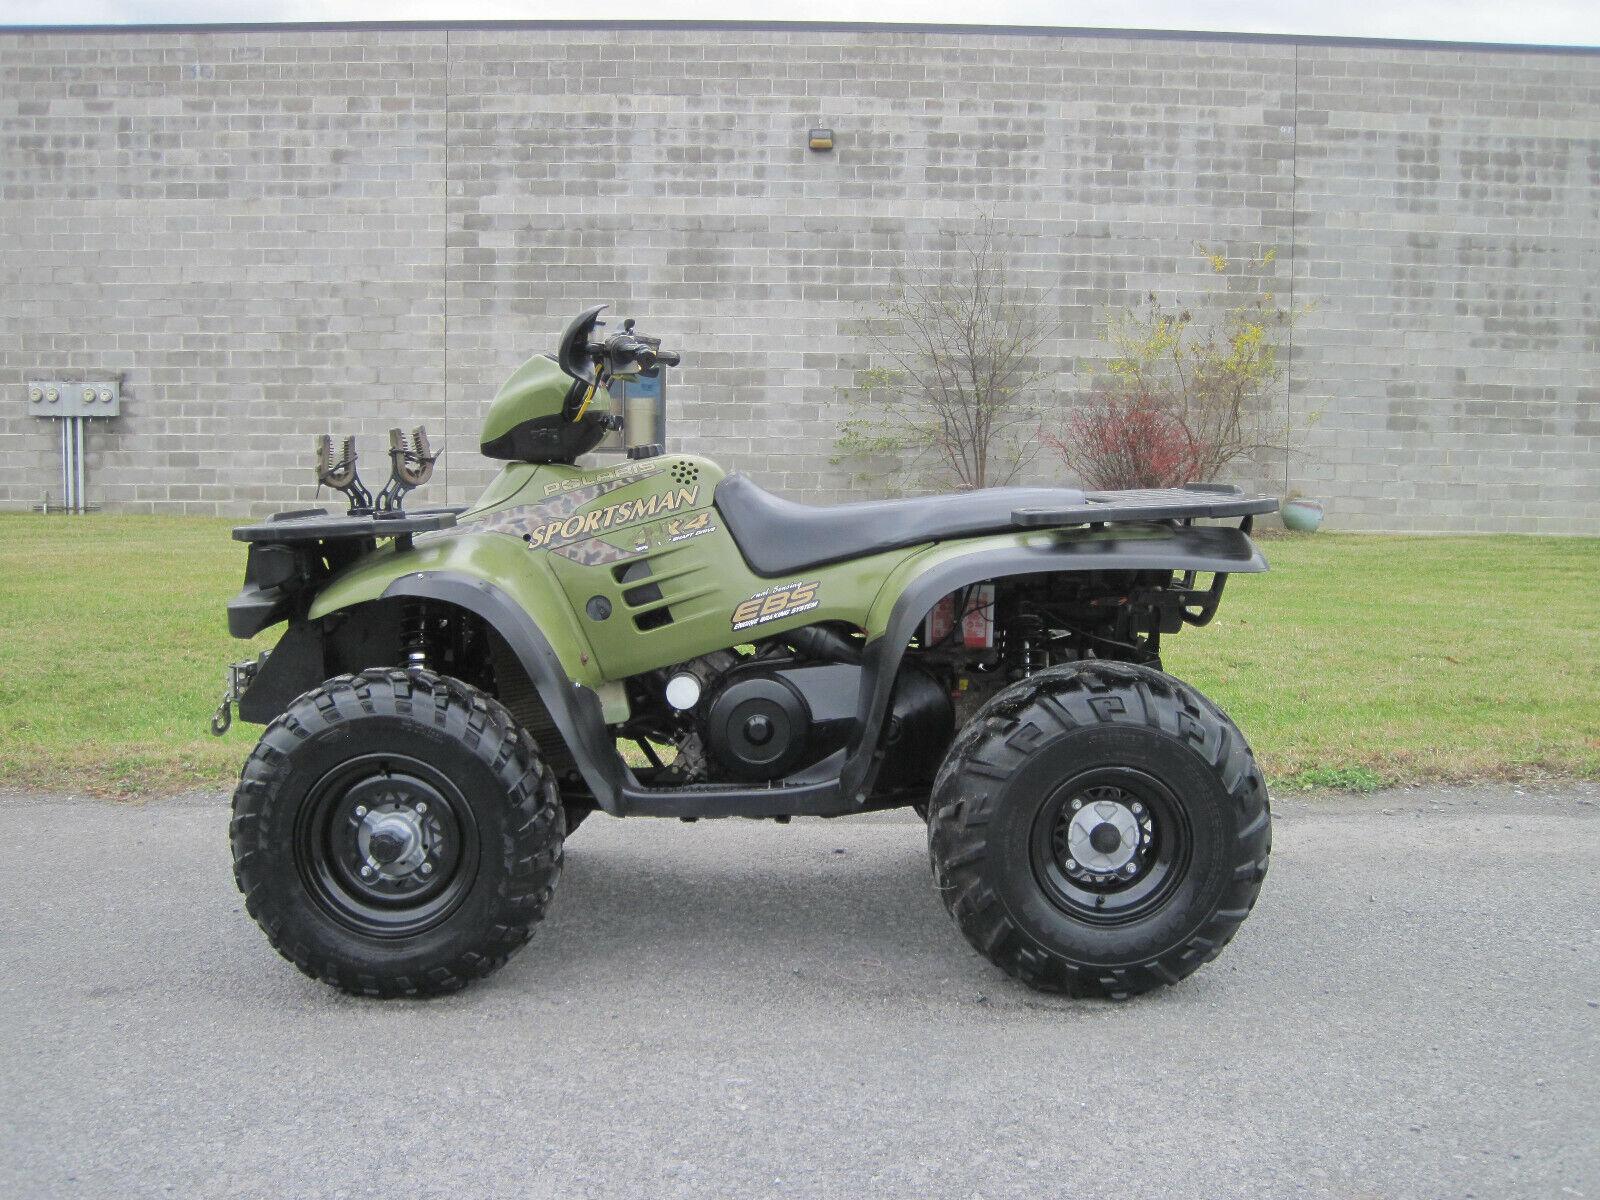 1999 POLARIS SPORTSMAN 500 HO 4X4 WINCH LOW MILES SHIPING XP ATV 500HO RARE